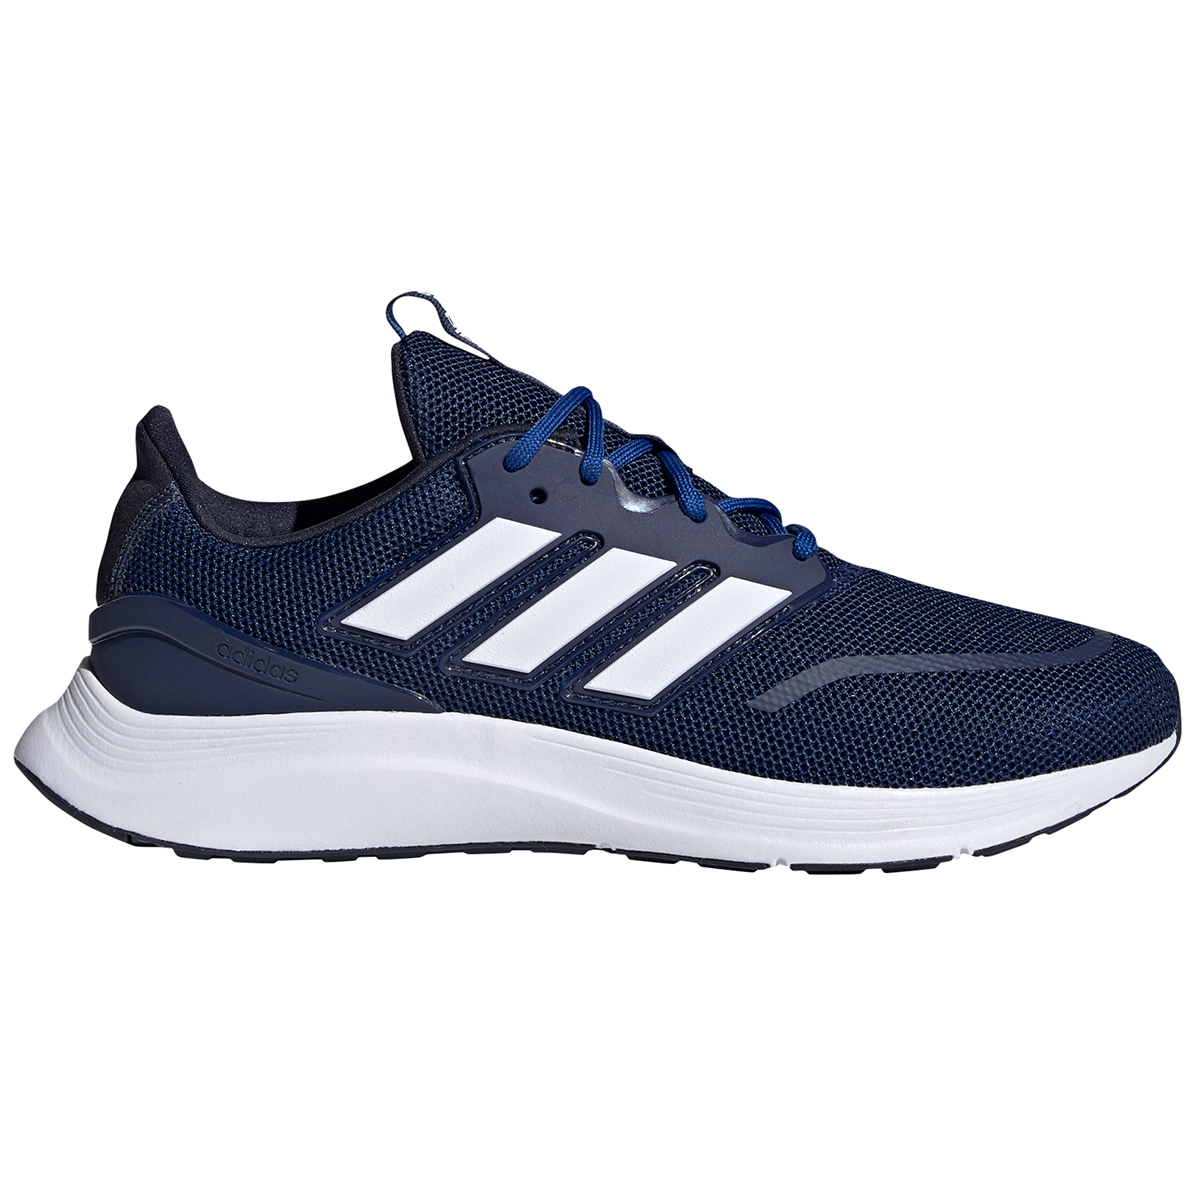 Adidas Men's Energy Falcon Running Shoes - Black, 11.5